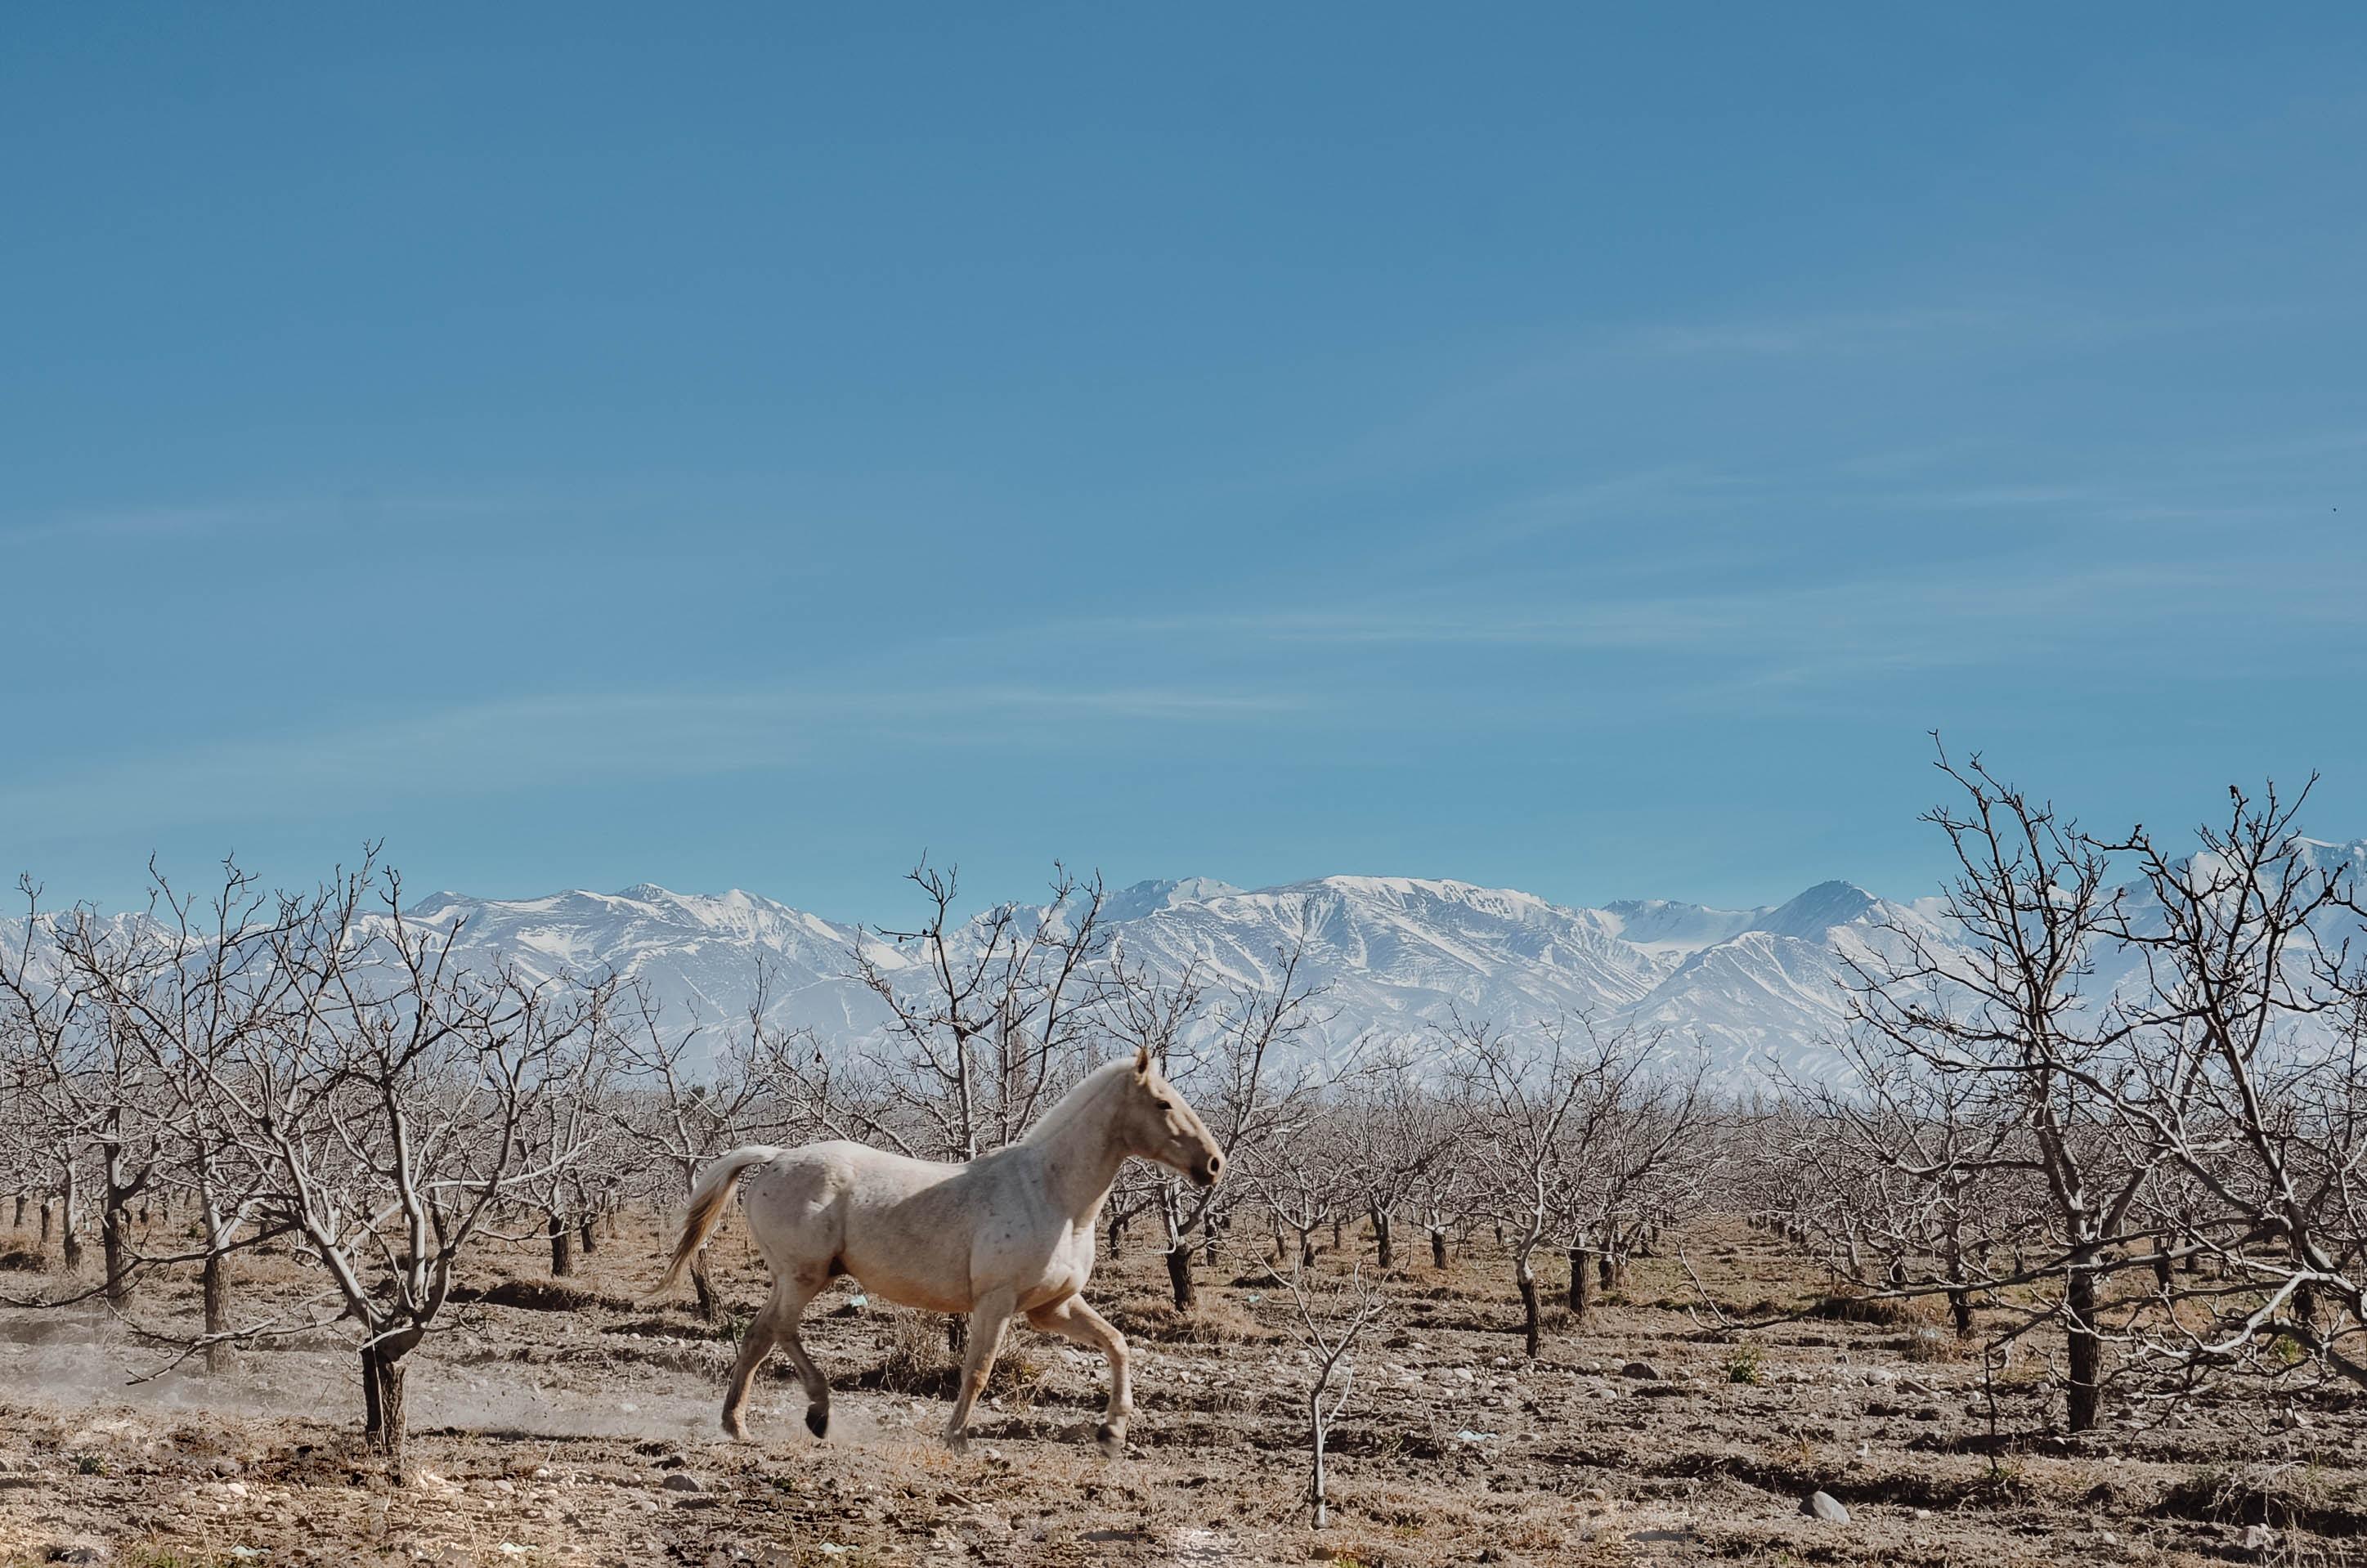 white stallion running on ground next to leafless trees